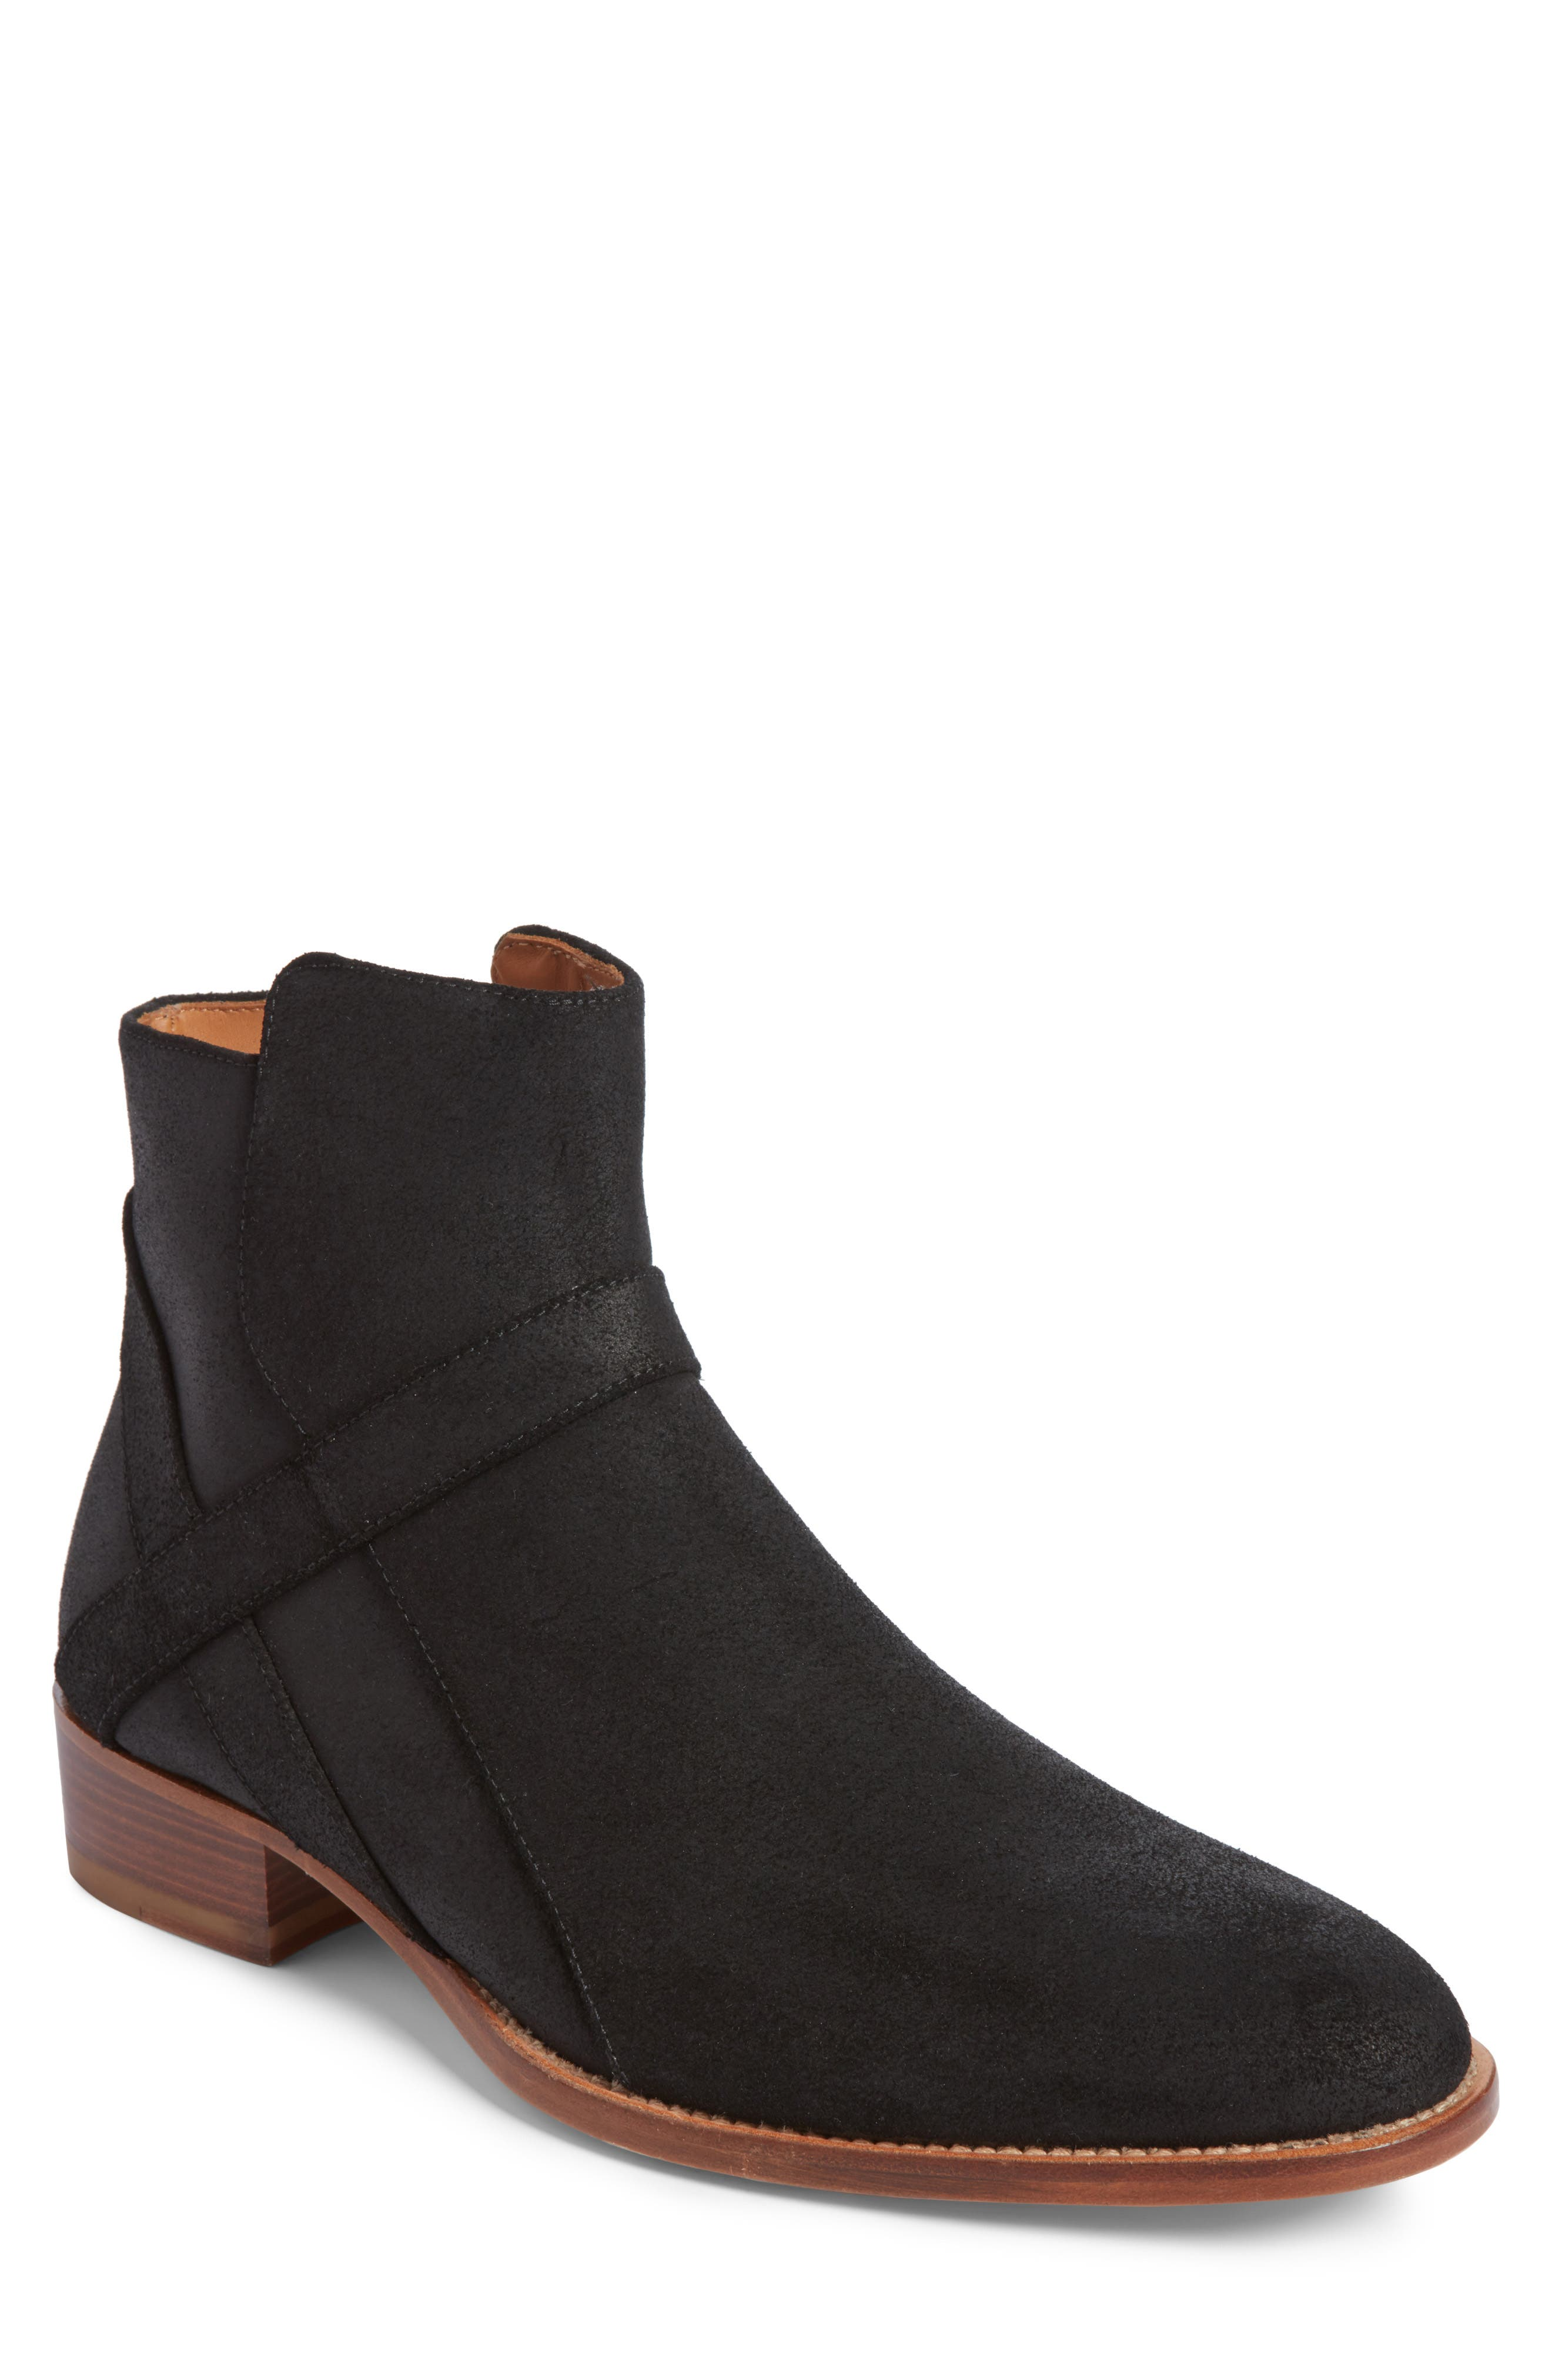 Bowie Zip Boot,                         Main,                         color, BLACK SUEDE